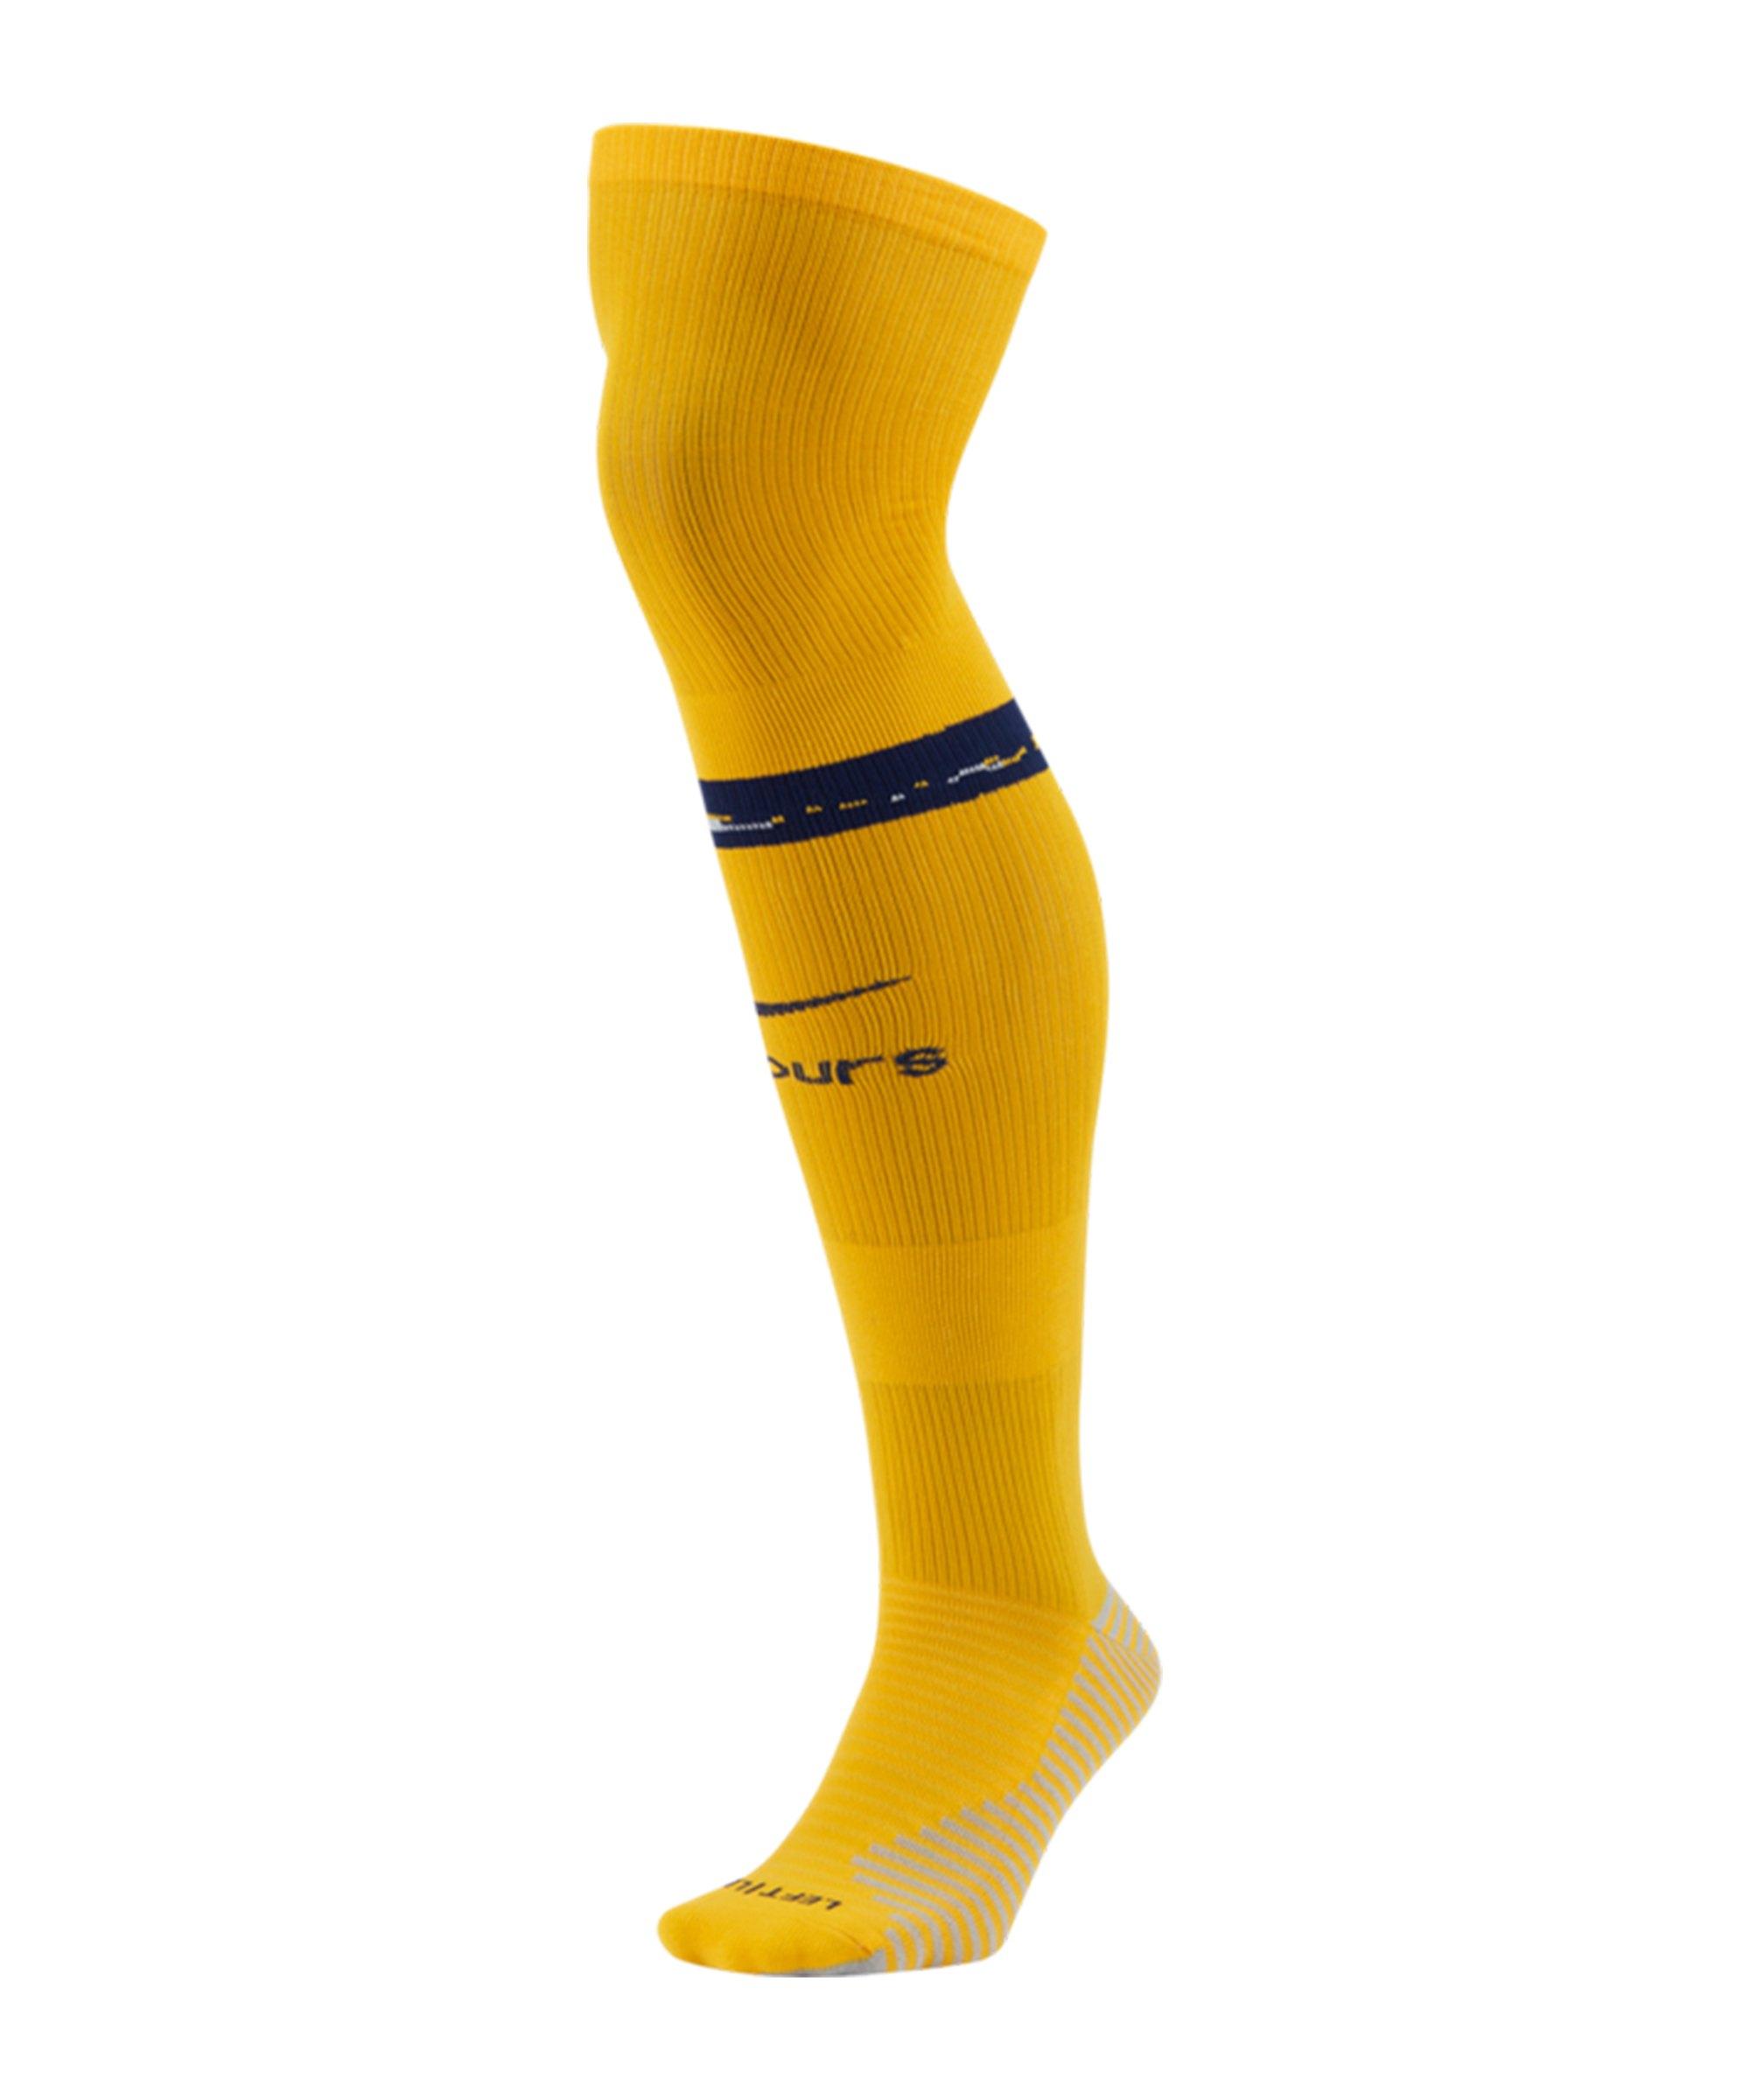 Nike Tottenham Hotspur Stutzen 3rd 2020/2021 Gelb F739 - gelb